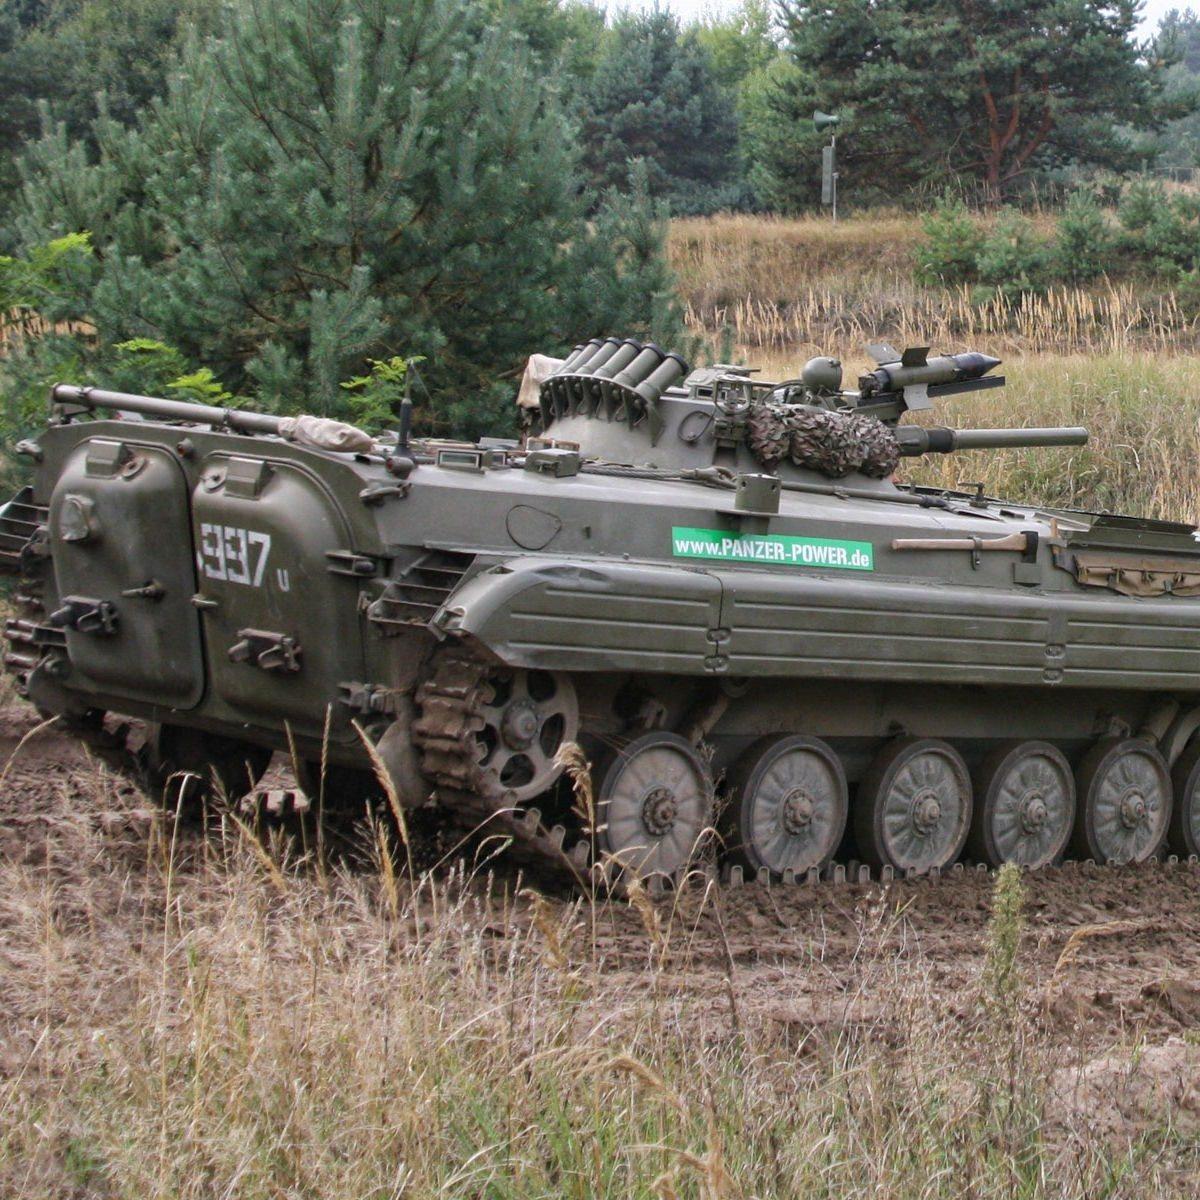 Panzer fahren - Raum Magdeburg